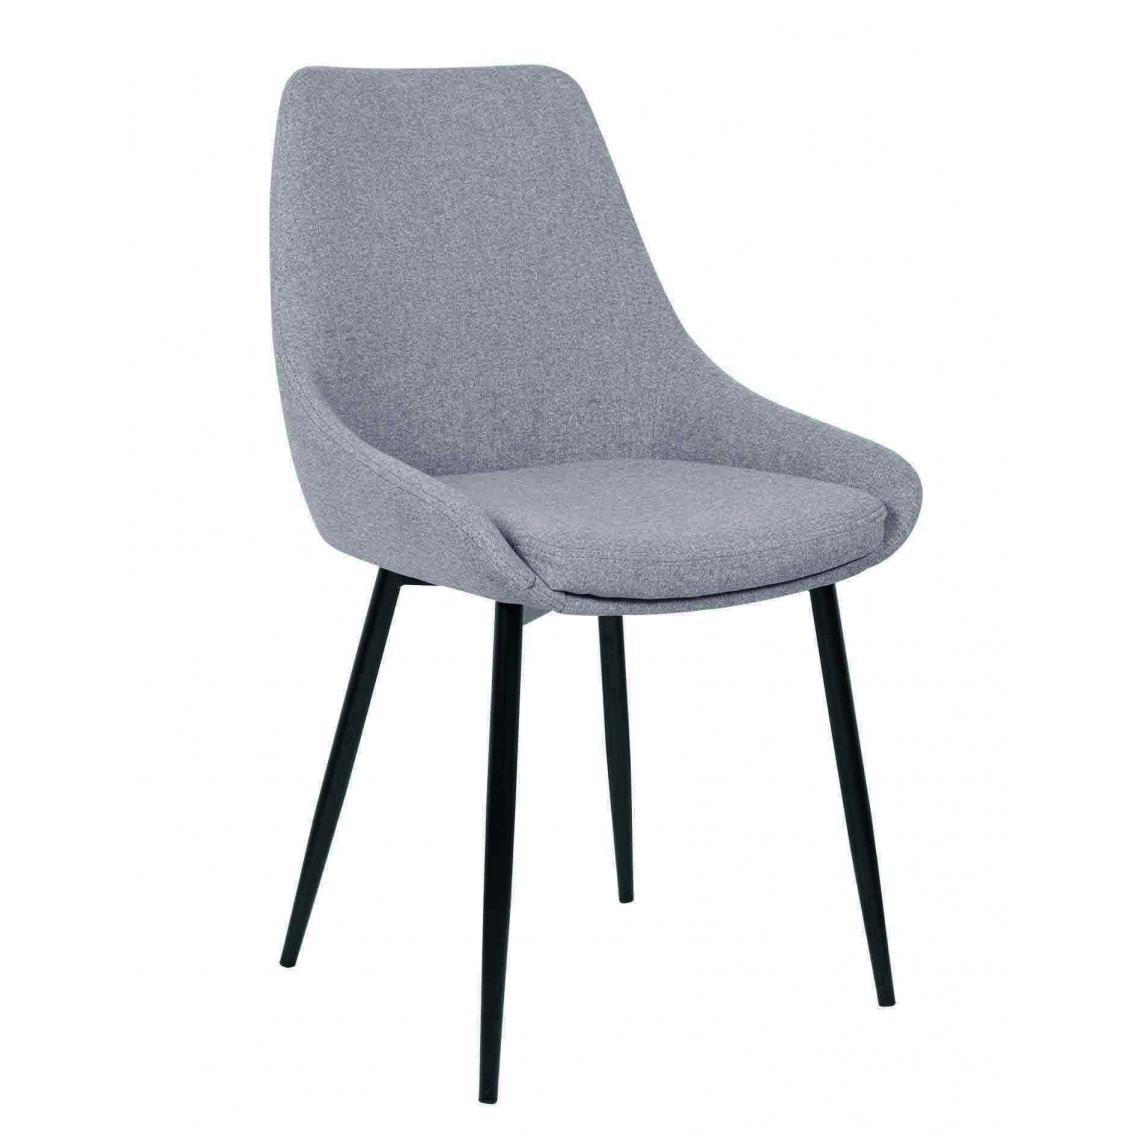 chaise tissu gris clair indo